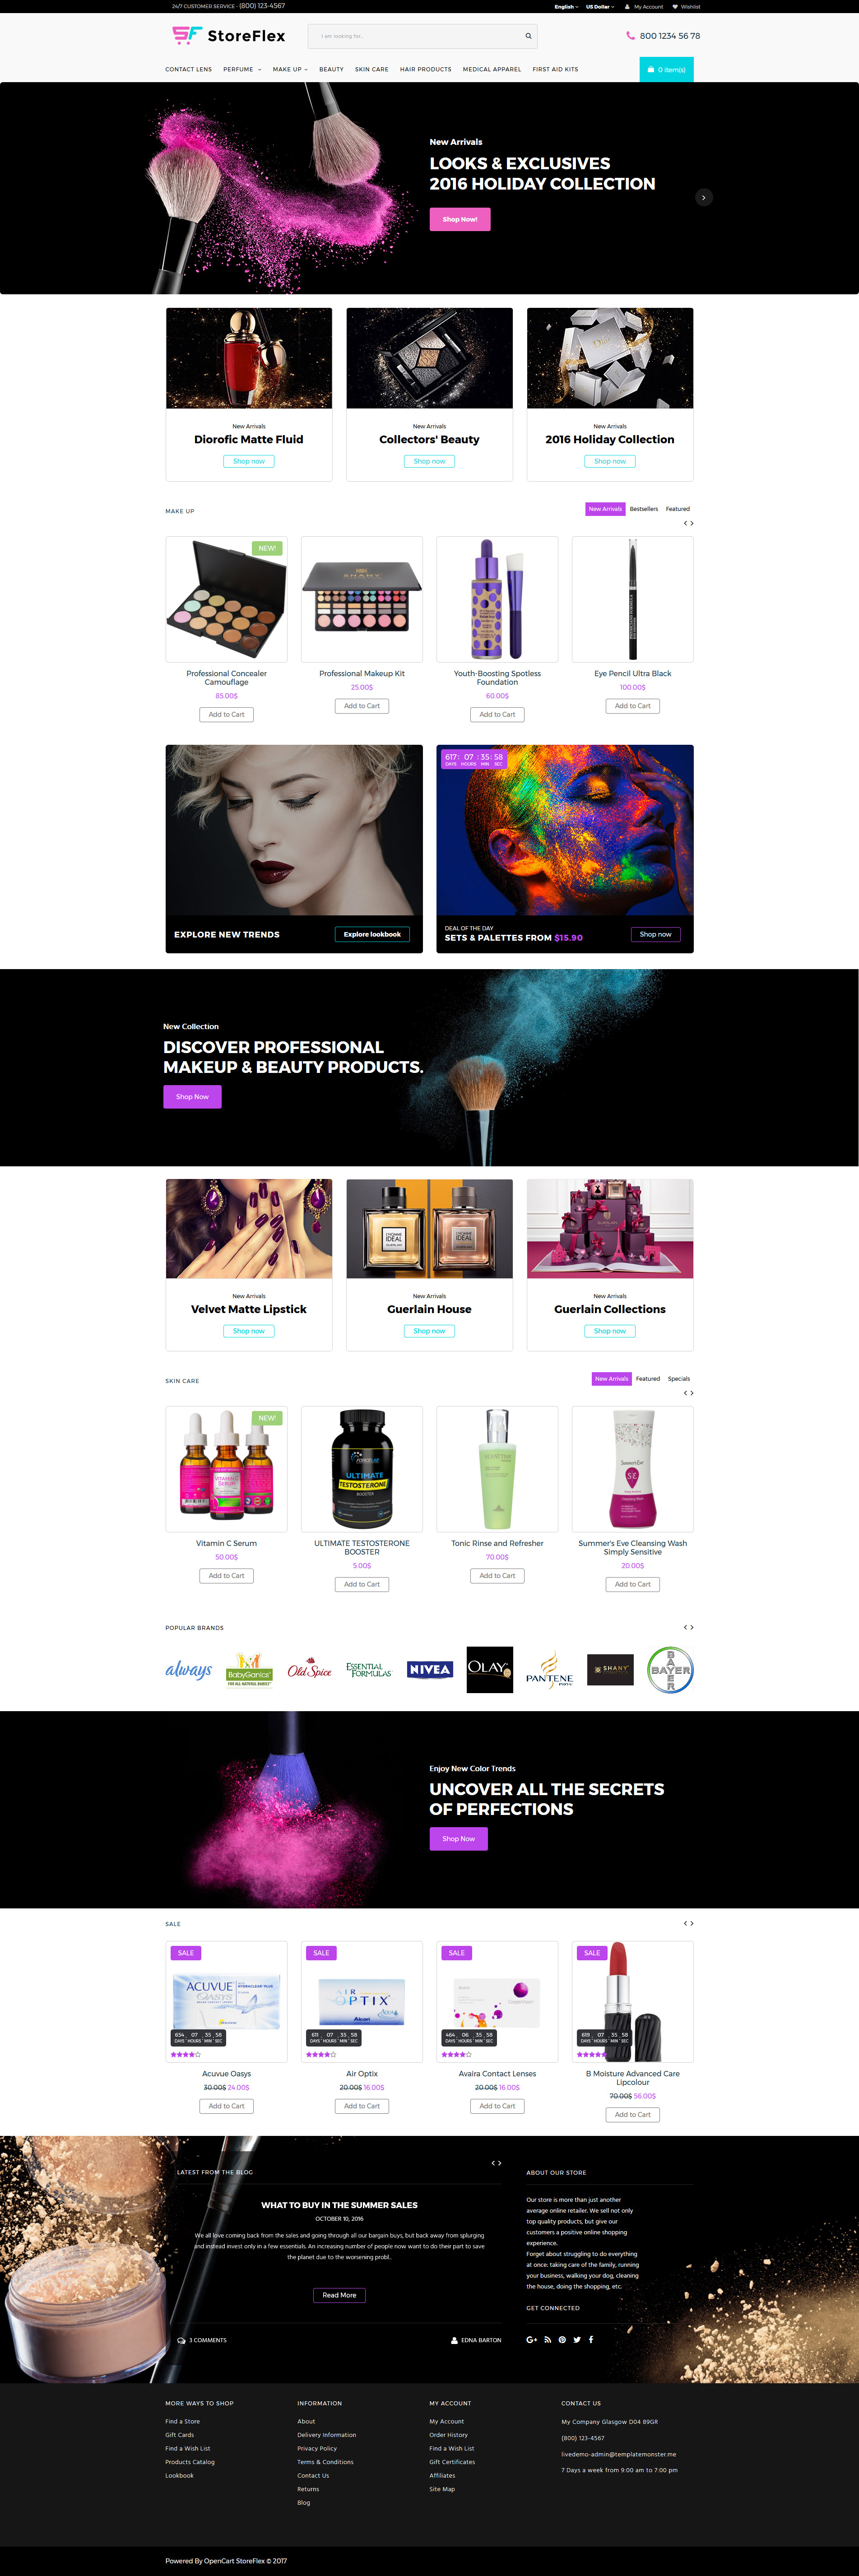 """StoreFlex - Cosmetics Store Responsive"" - адаптивний OpenCart шаблон №63354"